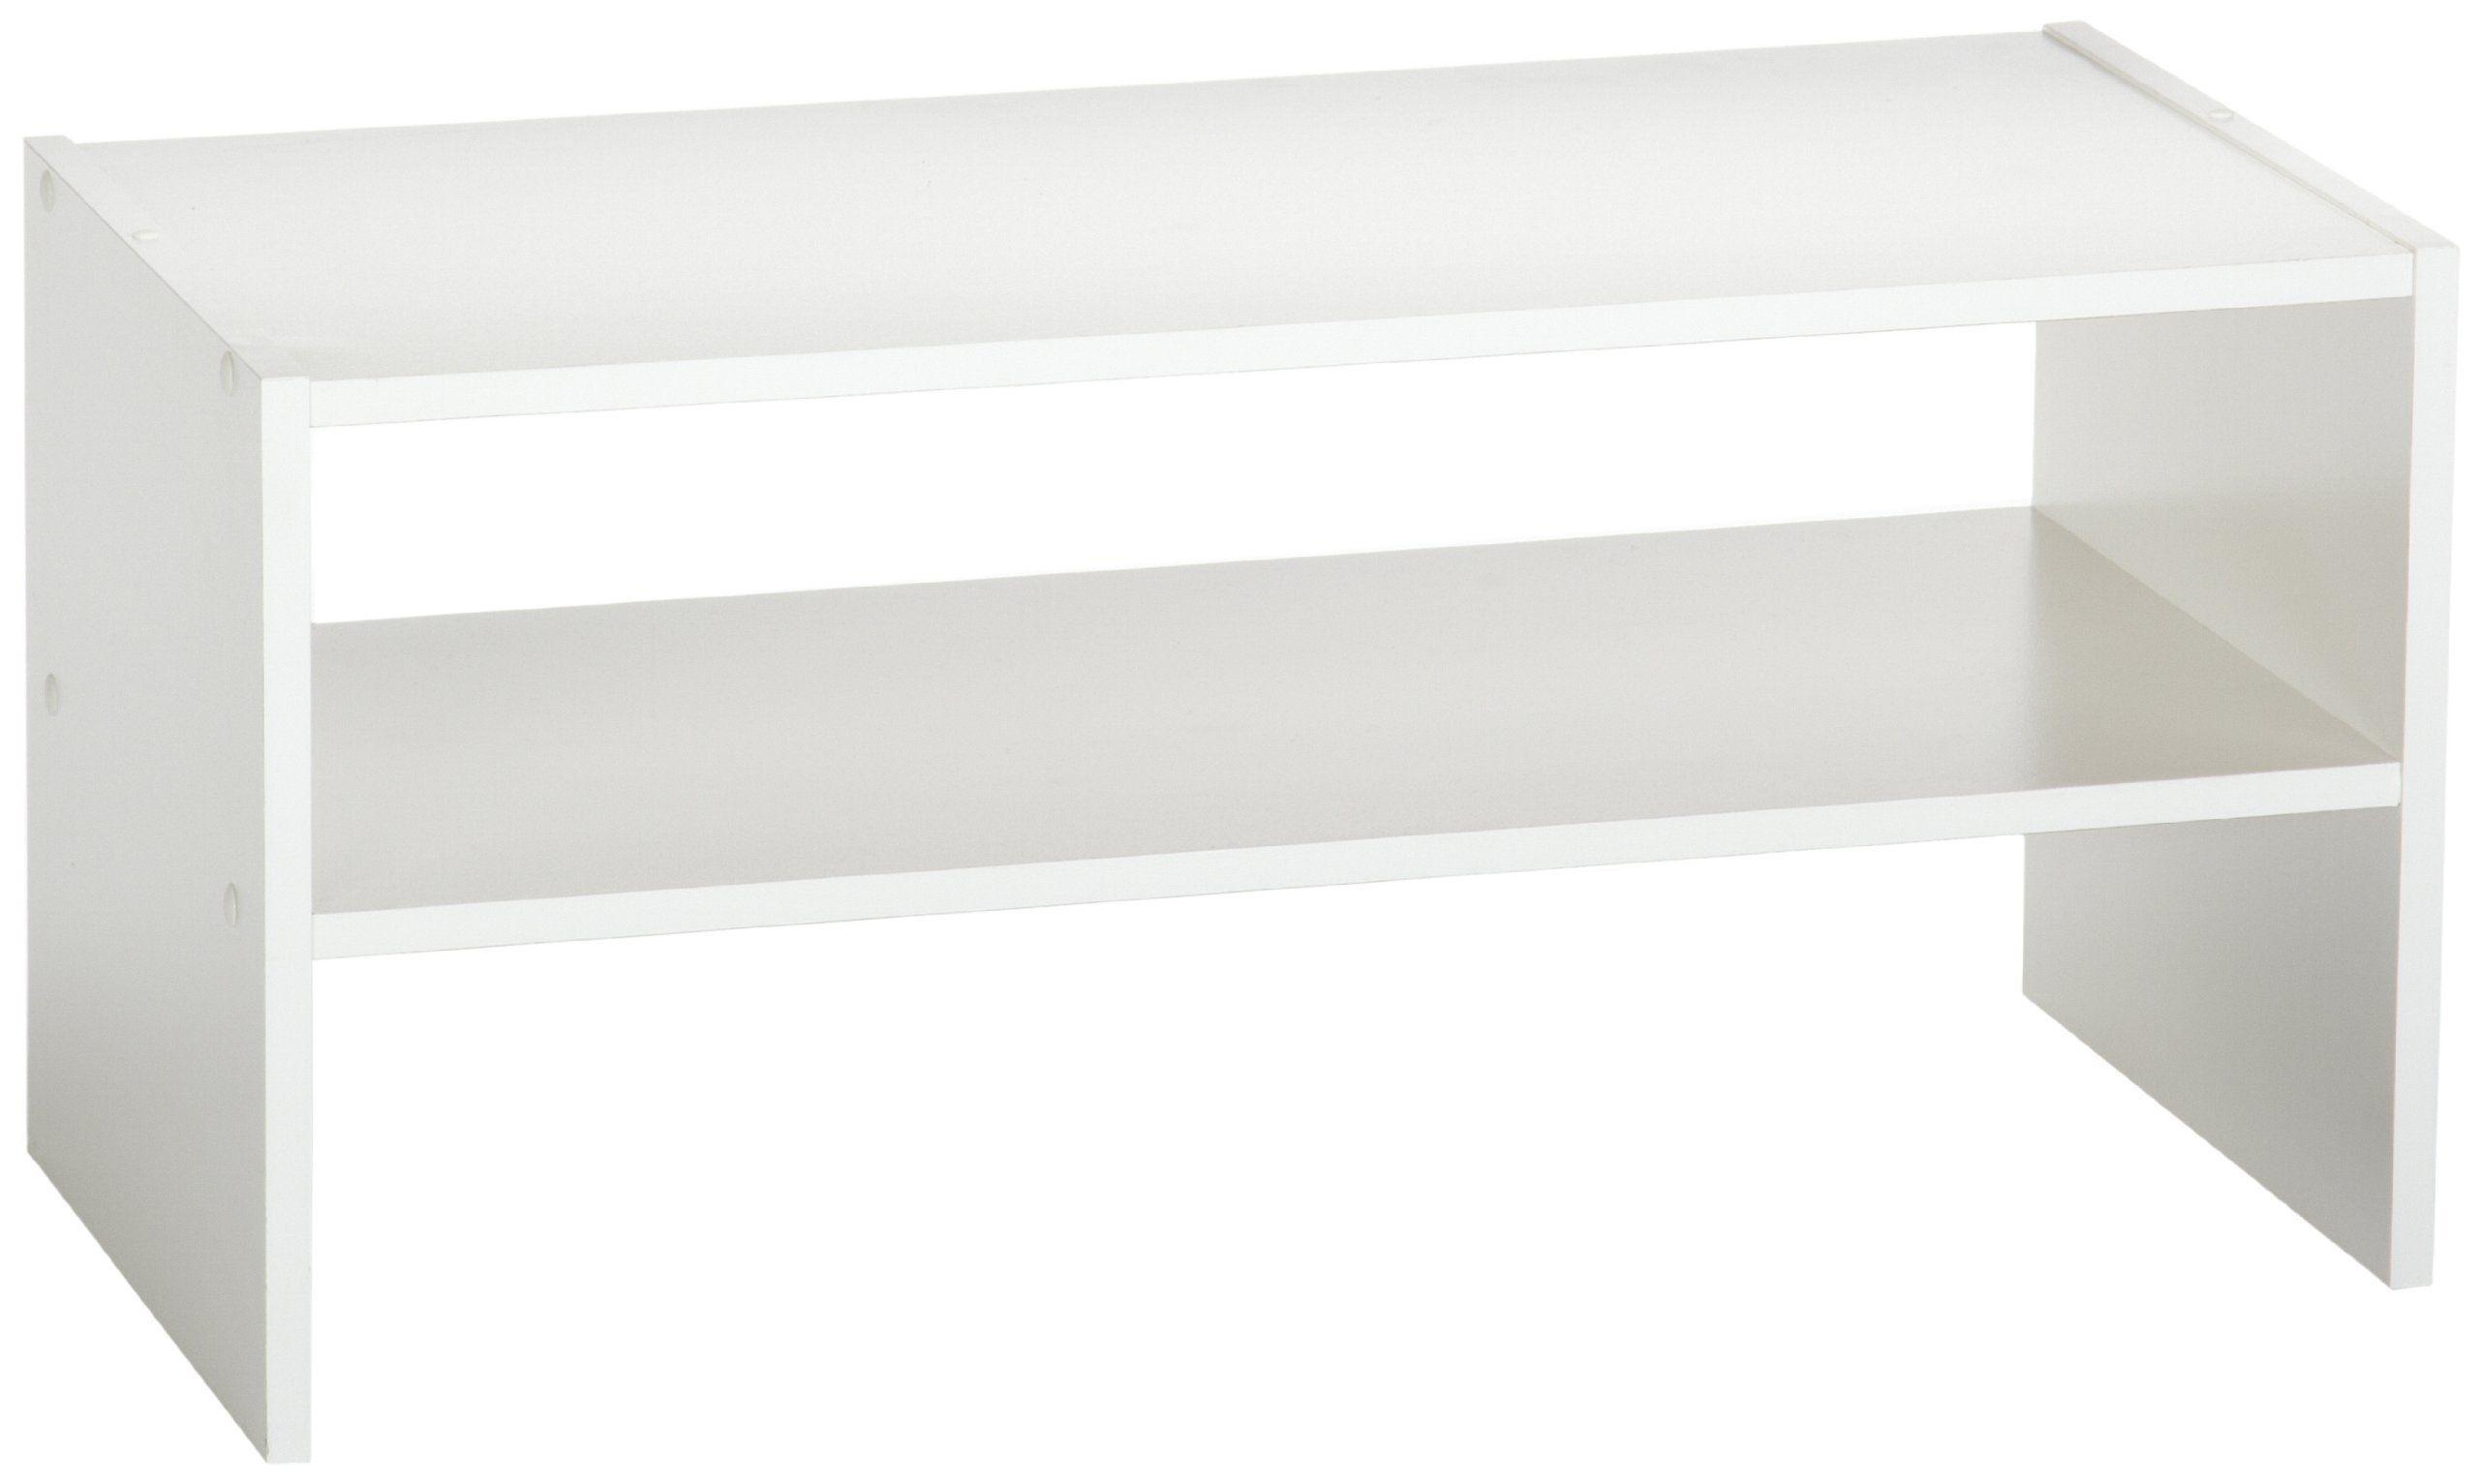 Closetmaid 8993 Stackable 24 Inch Wide Horizontal Organizer Shelves Space Saving Shoe Rack Linen Closet Organization